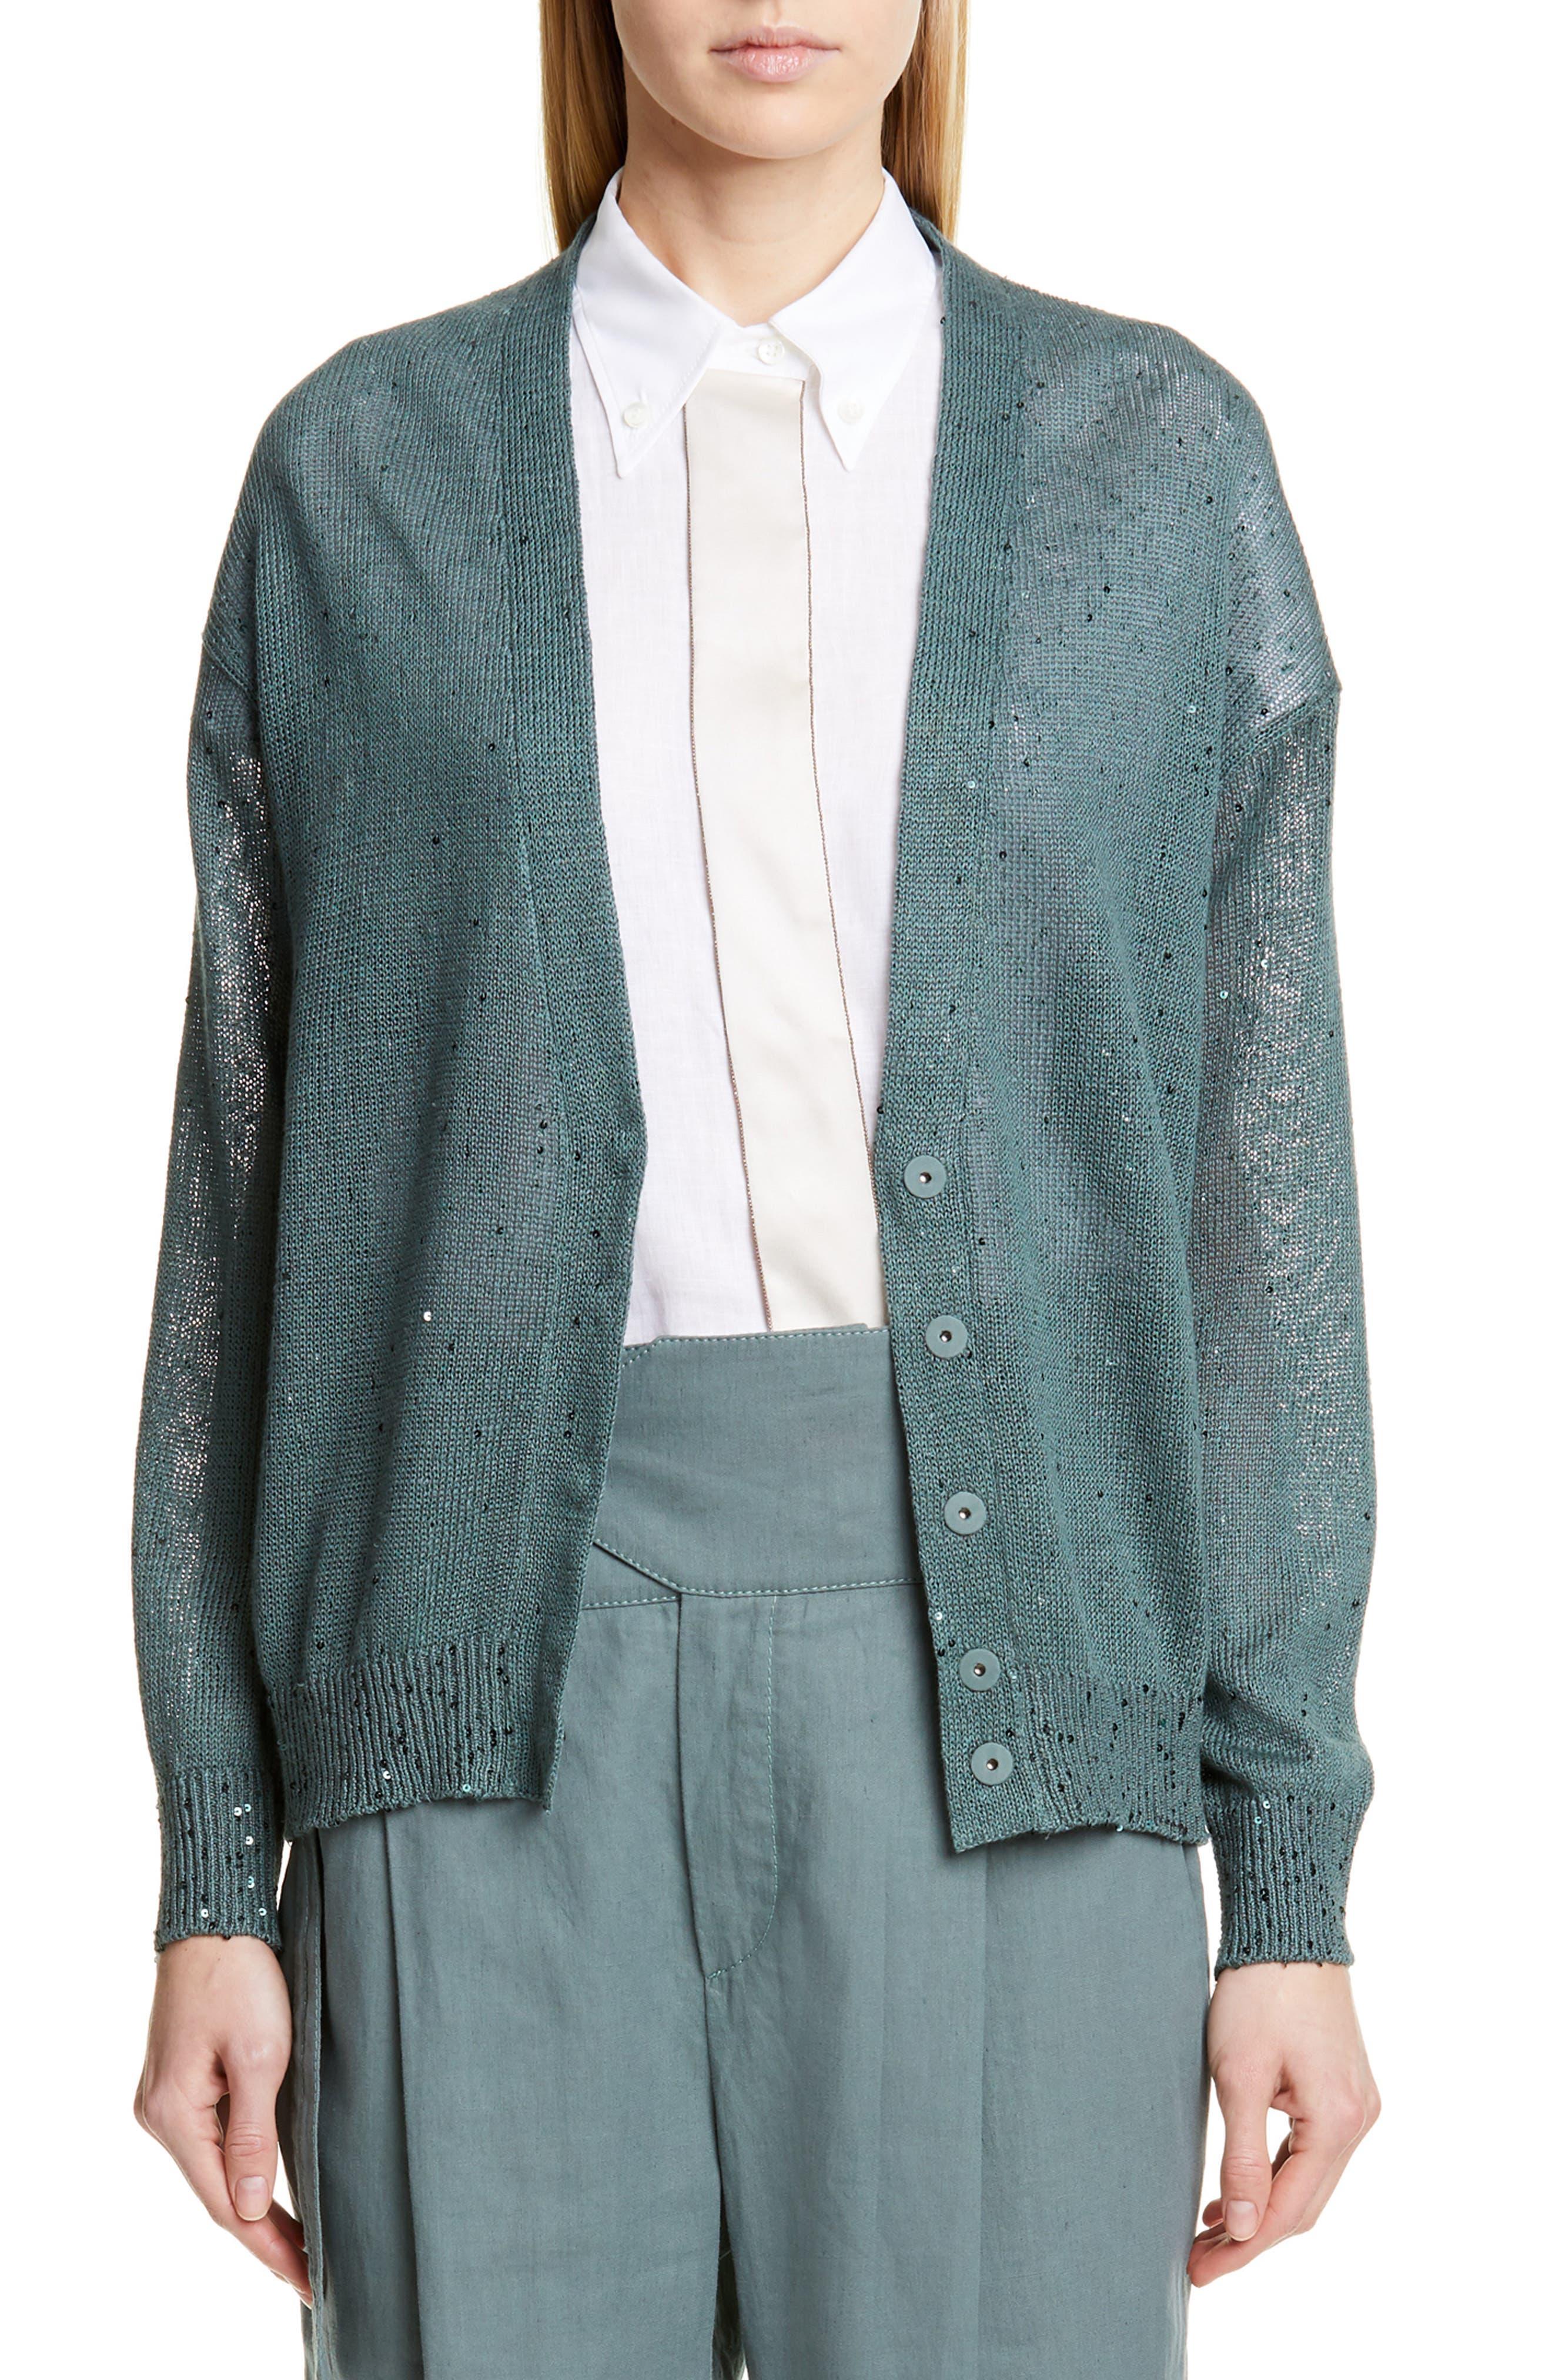 BRUNELLO CUCINELLI, Sequin Linen & Silk Cardigan, Main thumbnail 1, color, SAGE